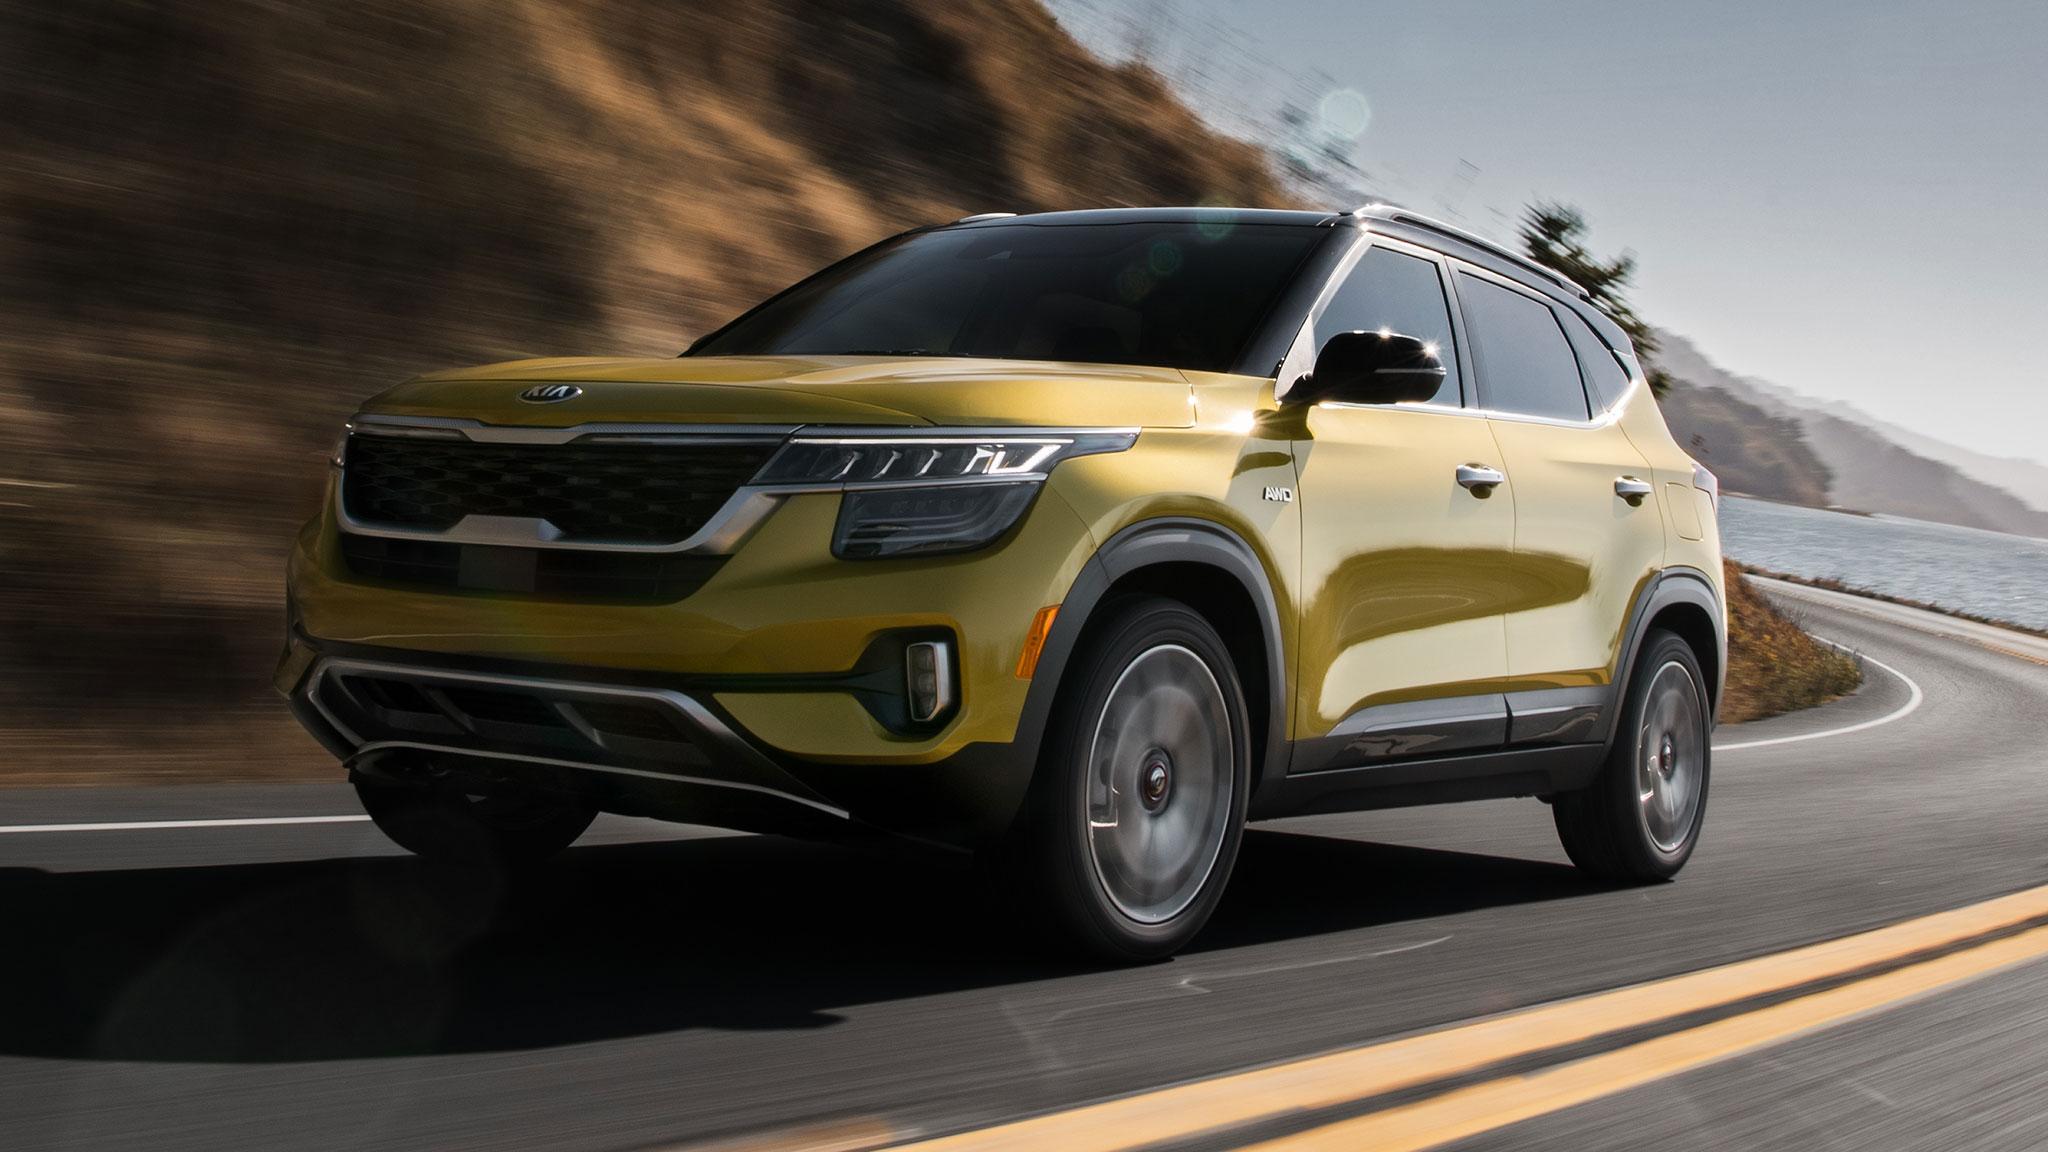 2021 Kia Seltos Compact SUV Puts on a Refined Face | Automobile